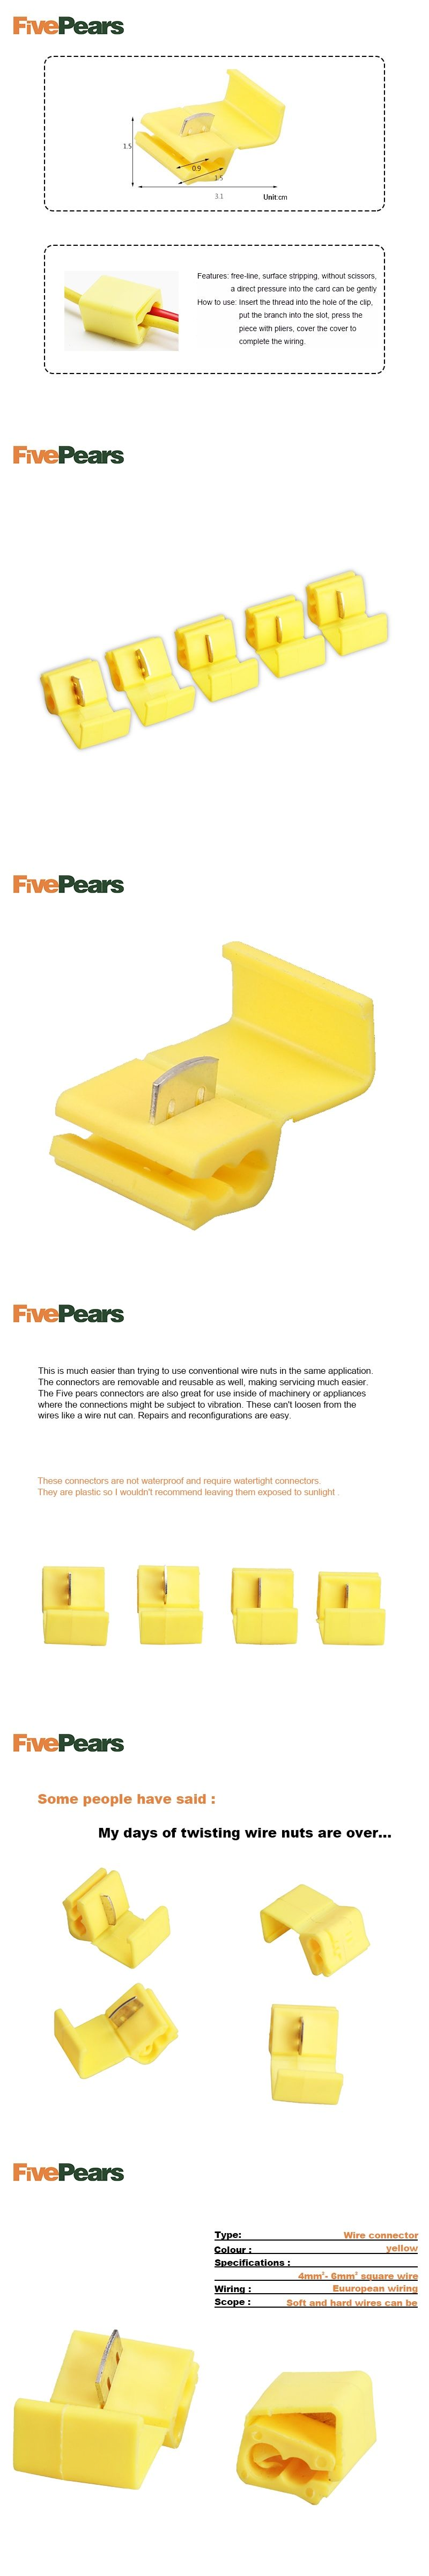 Free Shipping Fivepears 50pcs Yellow Scotch Lockauto Quick Lock Wiring Connector Splice Wire